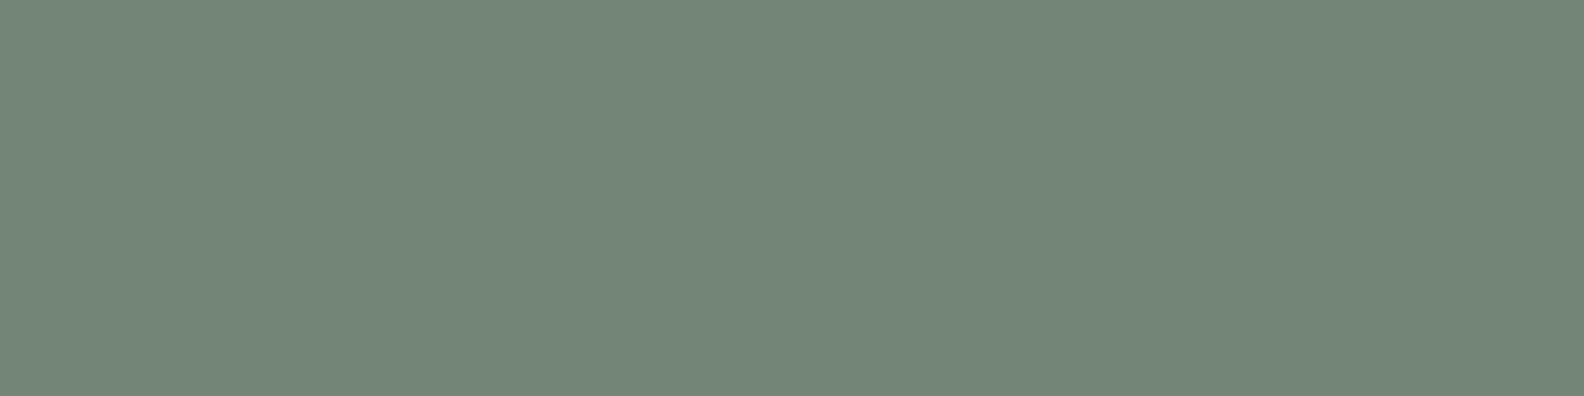 1584x396 Xanadu Solid Color Background